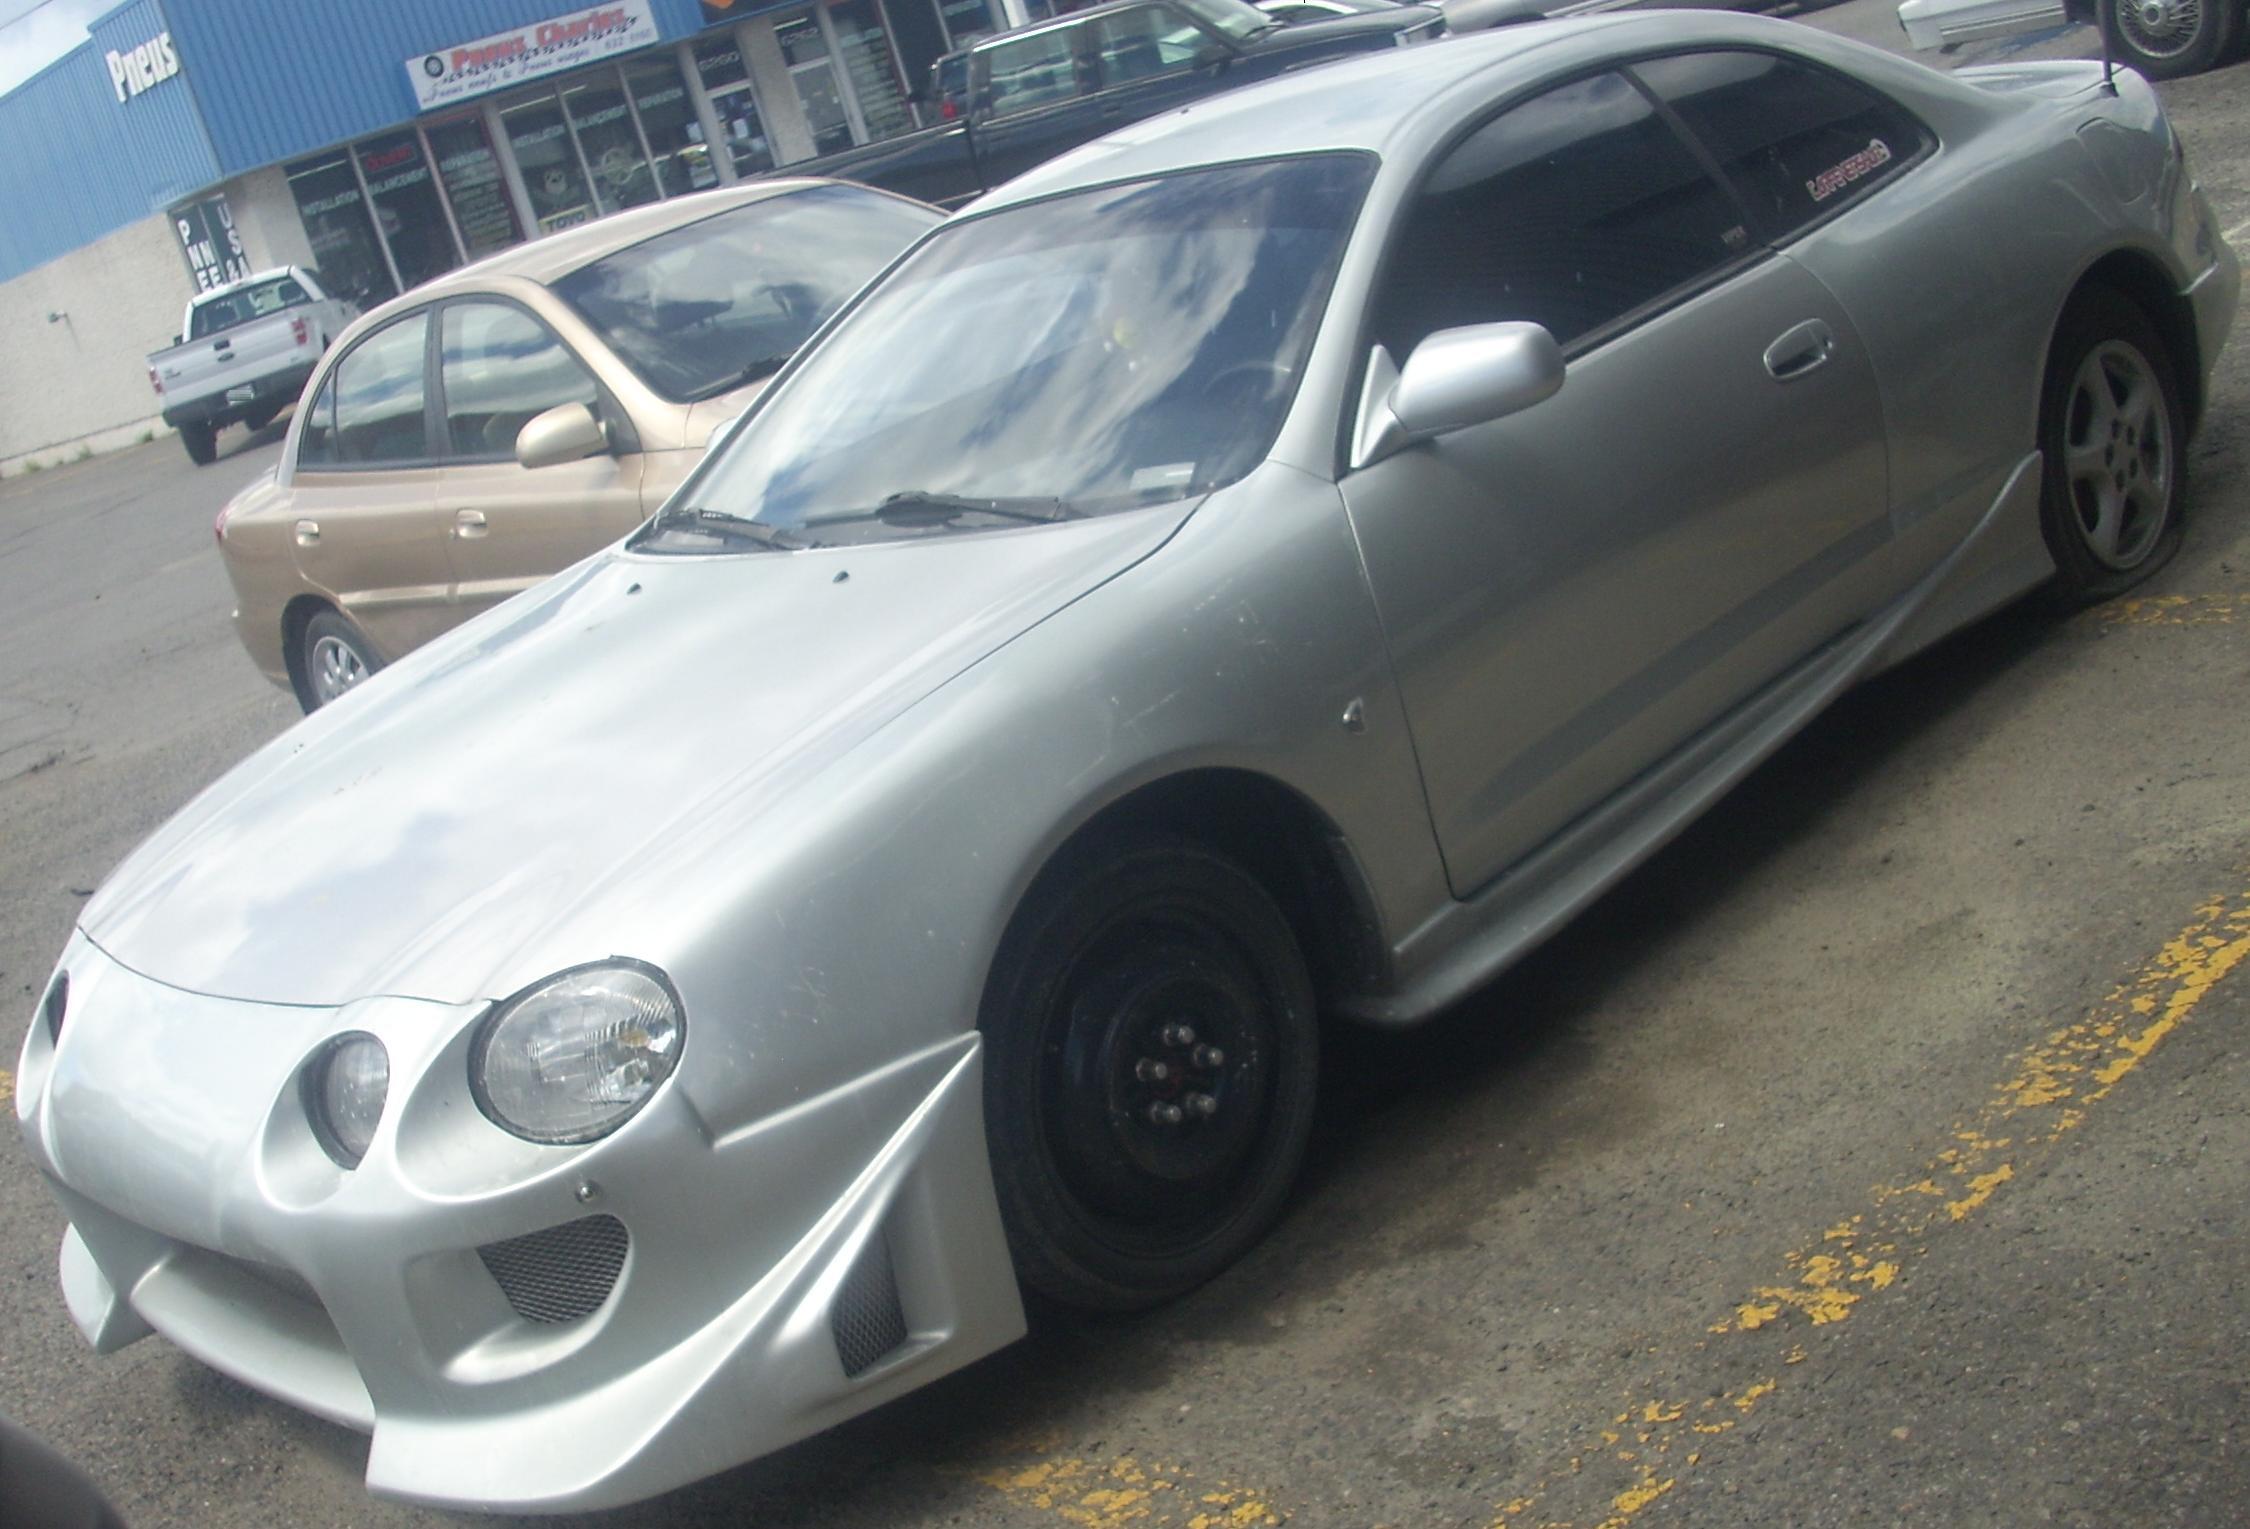 Toyota Celica 1.8 TS